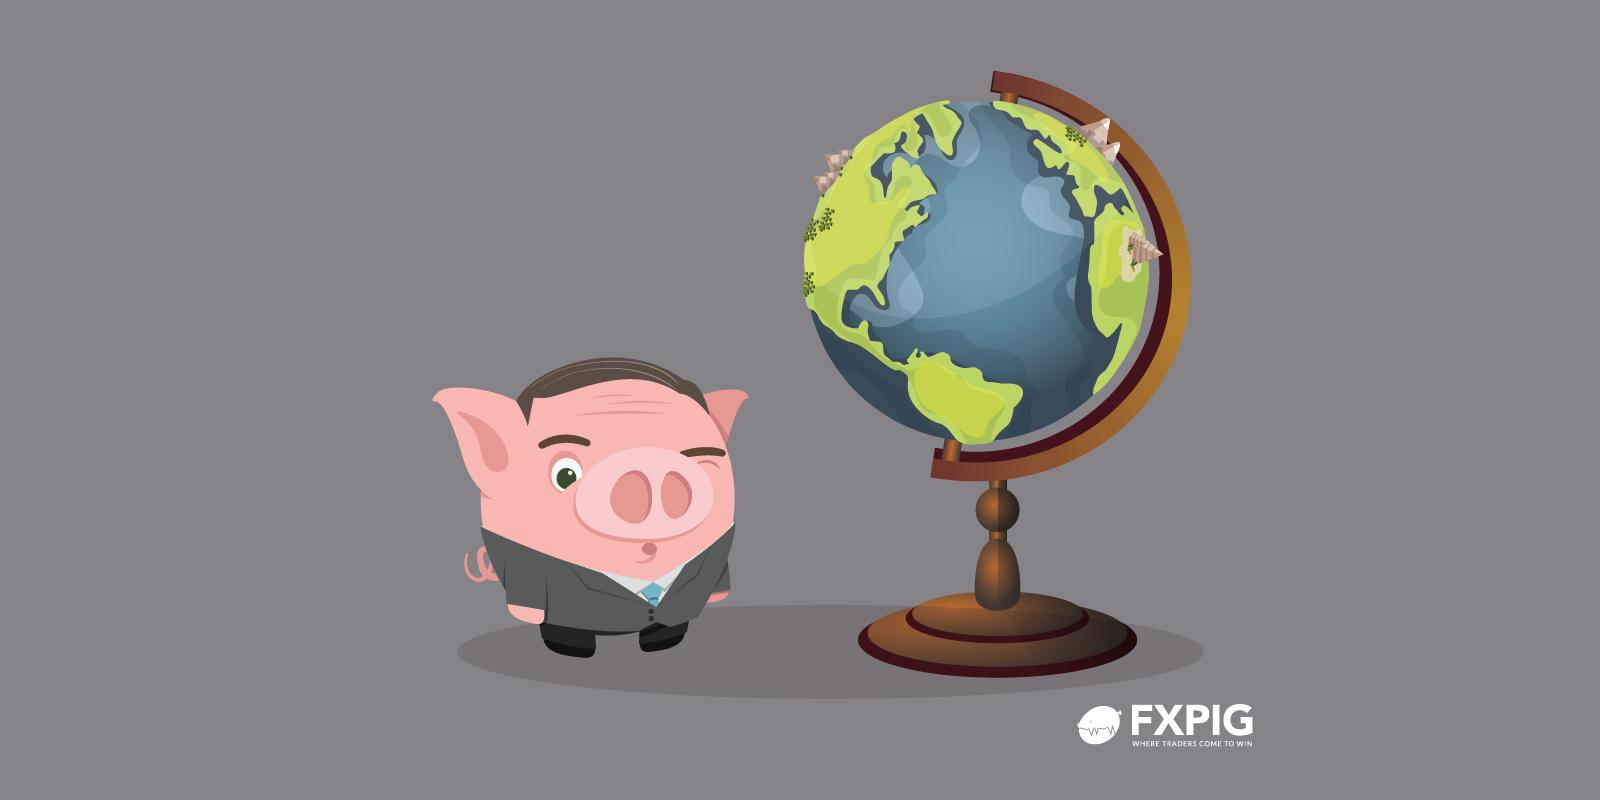 Markets-focused-on-geopolitical-risks-Forex_FXPIG